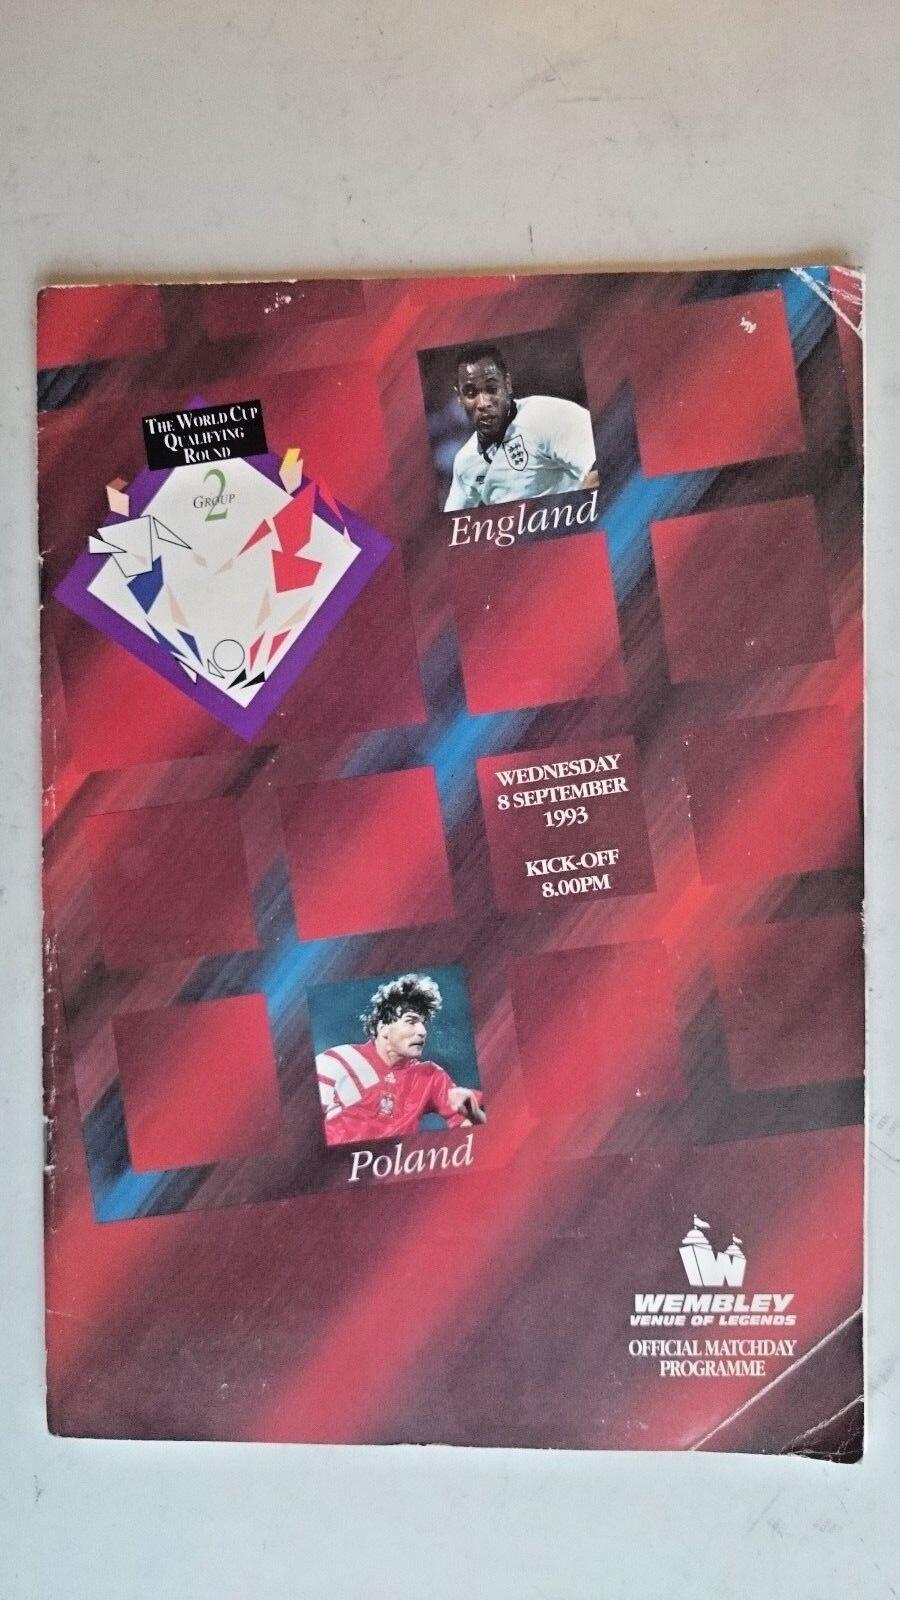 England v Poland..Official Matchday Programme..(8th September 1993)